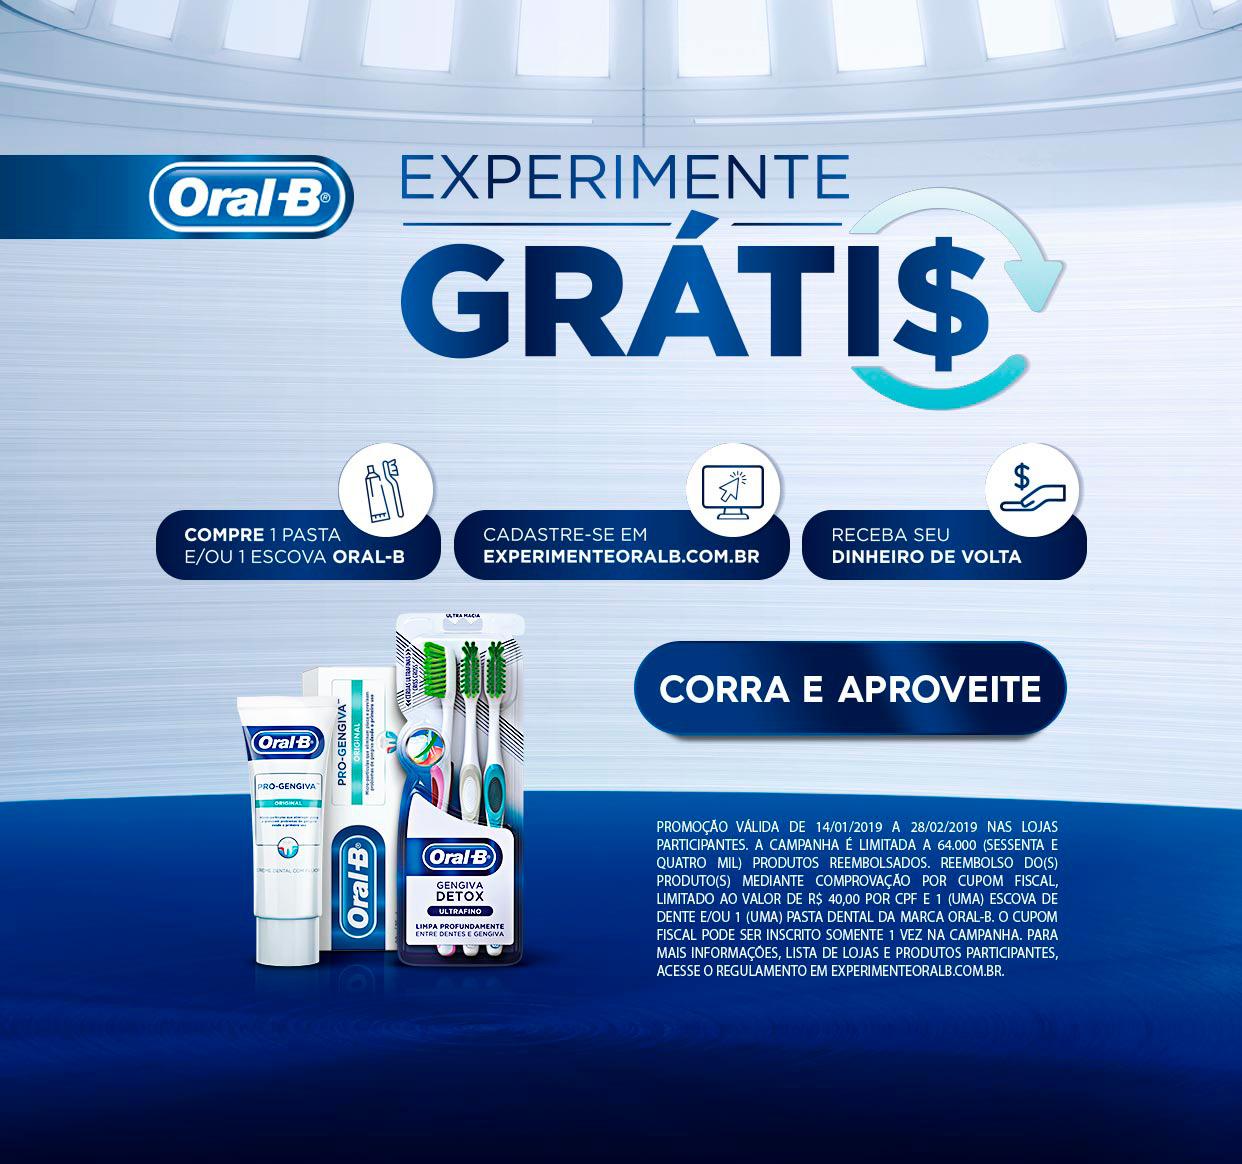 MOBILE oral b experimente gratis